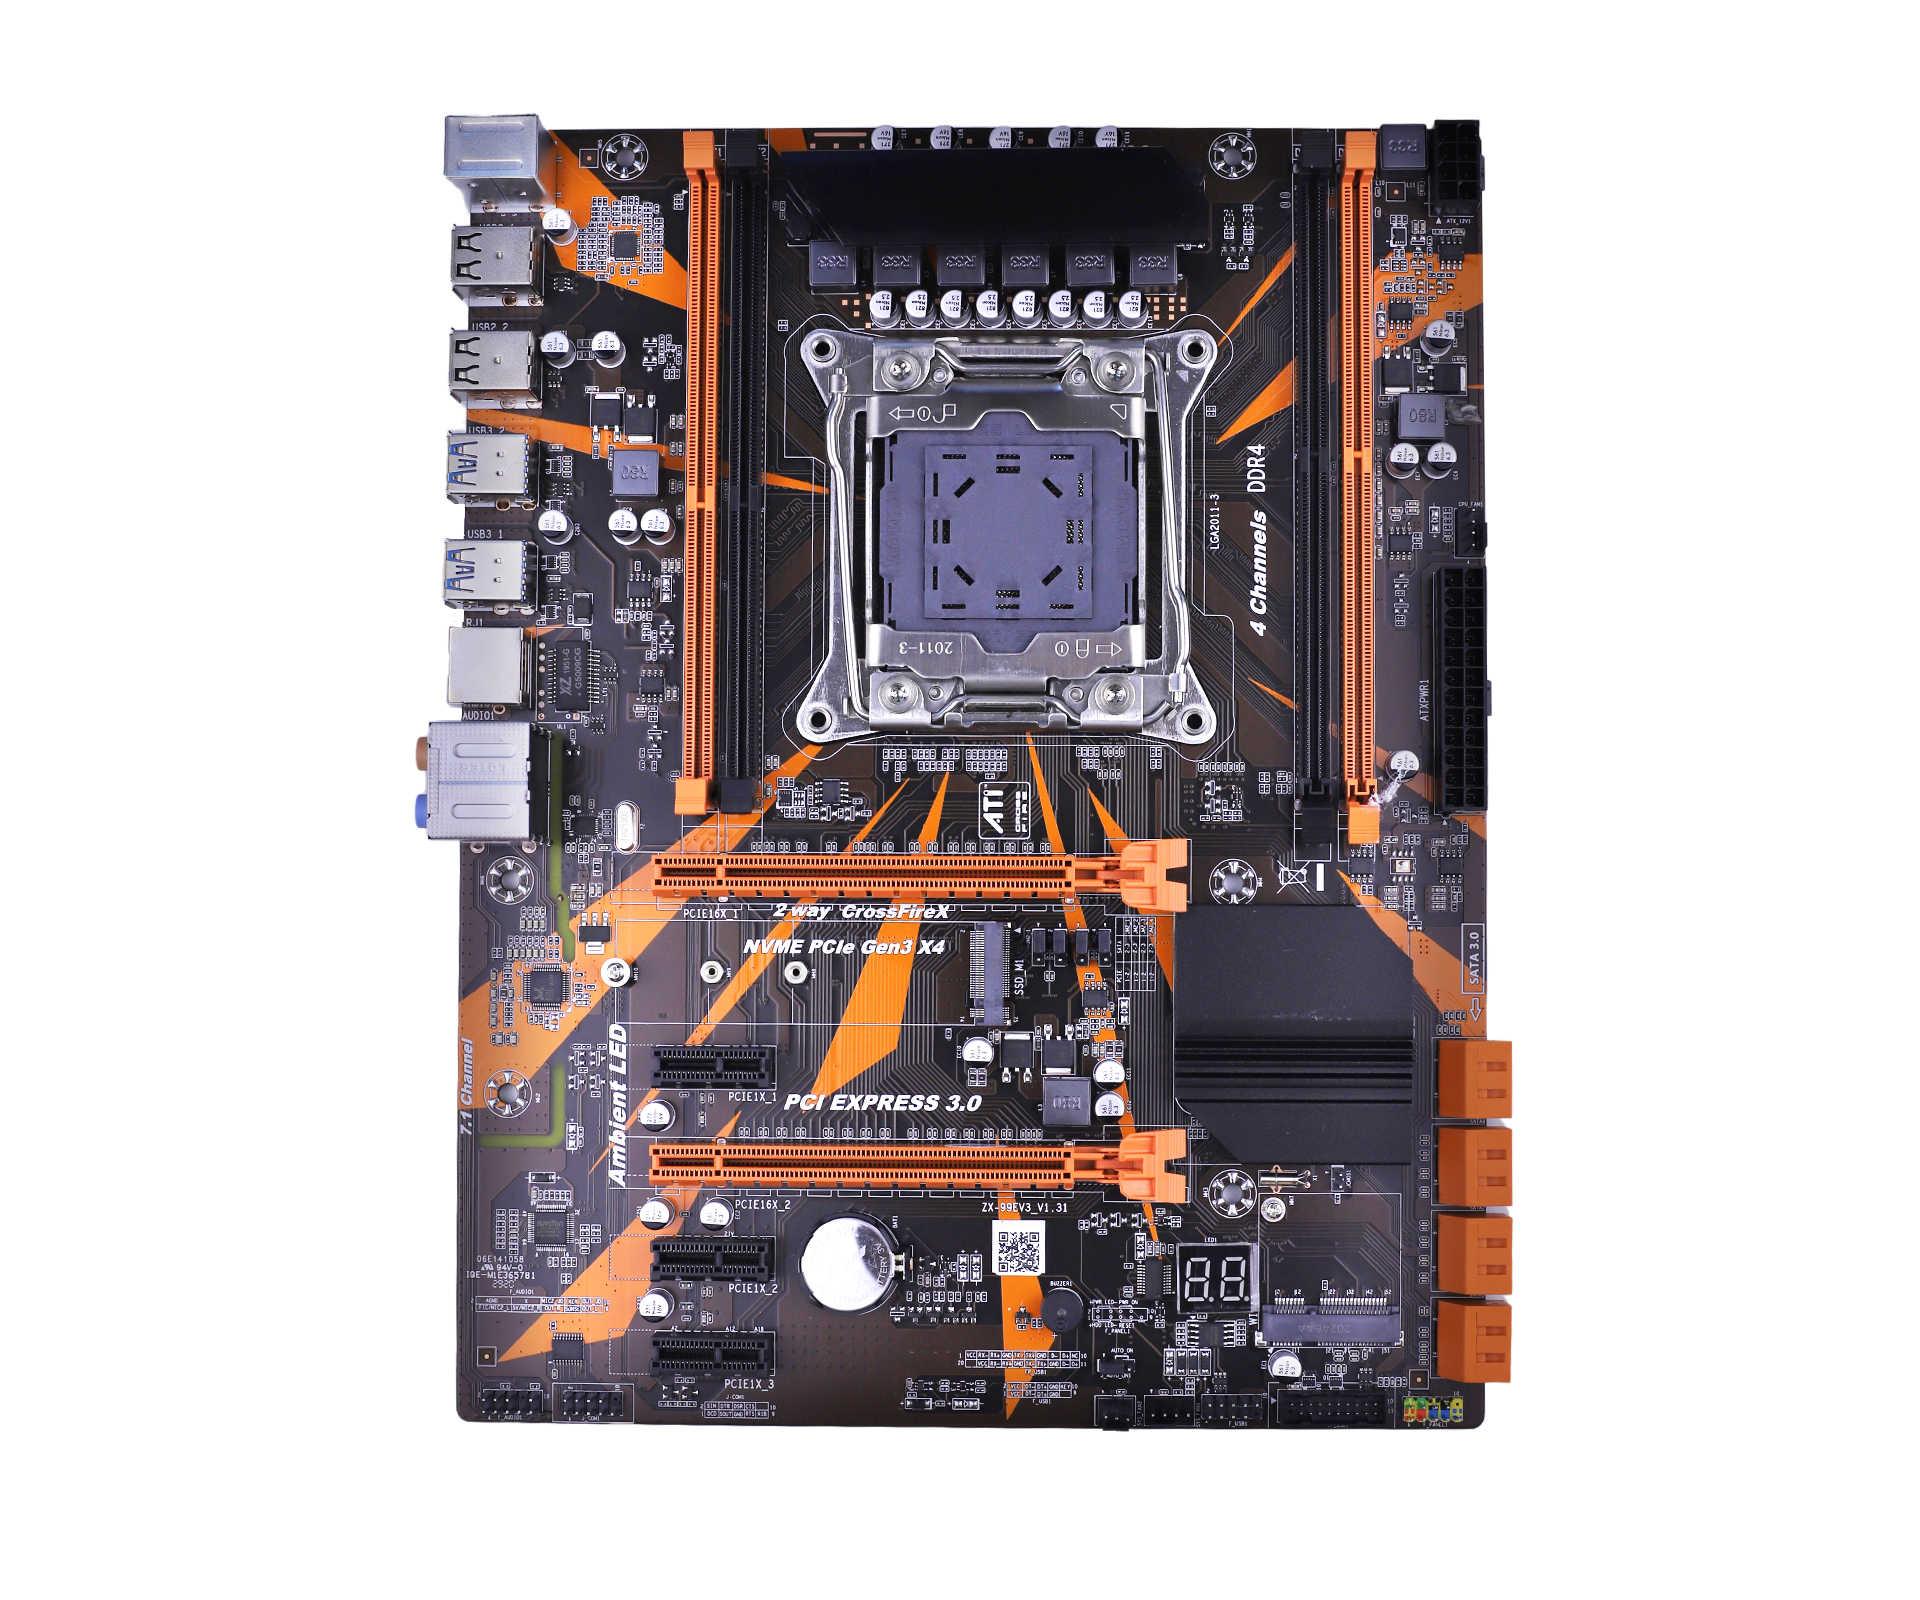 LGA 2011 V3 Motherboard X99 REG ECC SATA 3,0 Mit M.2 NVME SSD USB 3,0 Speicher DDR4 64G 2011 3 Mainboard LGA2011-3 für I7 Xeon E5